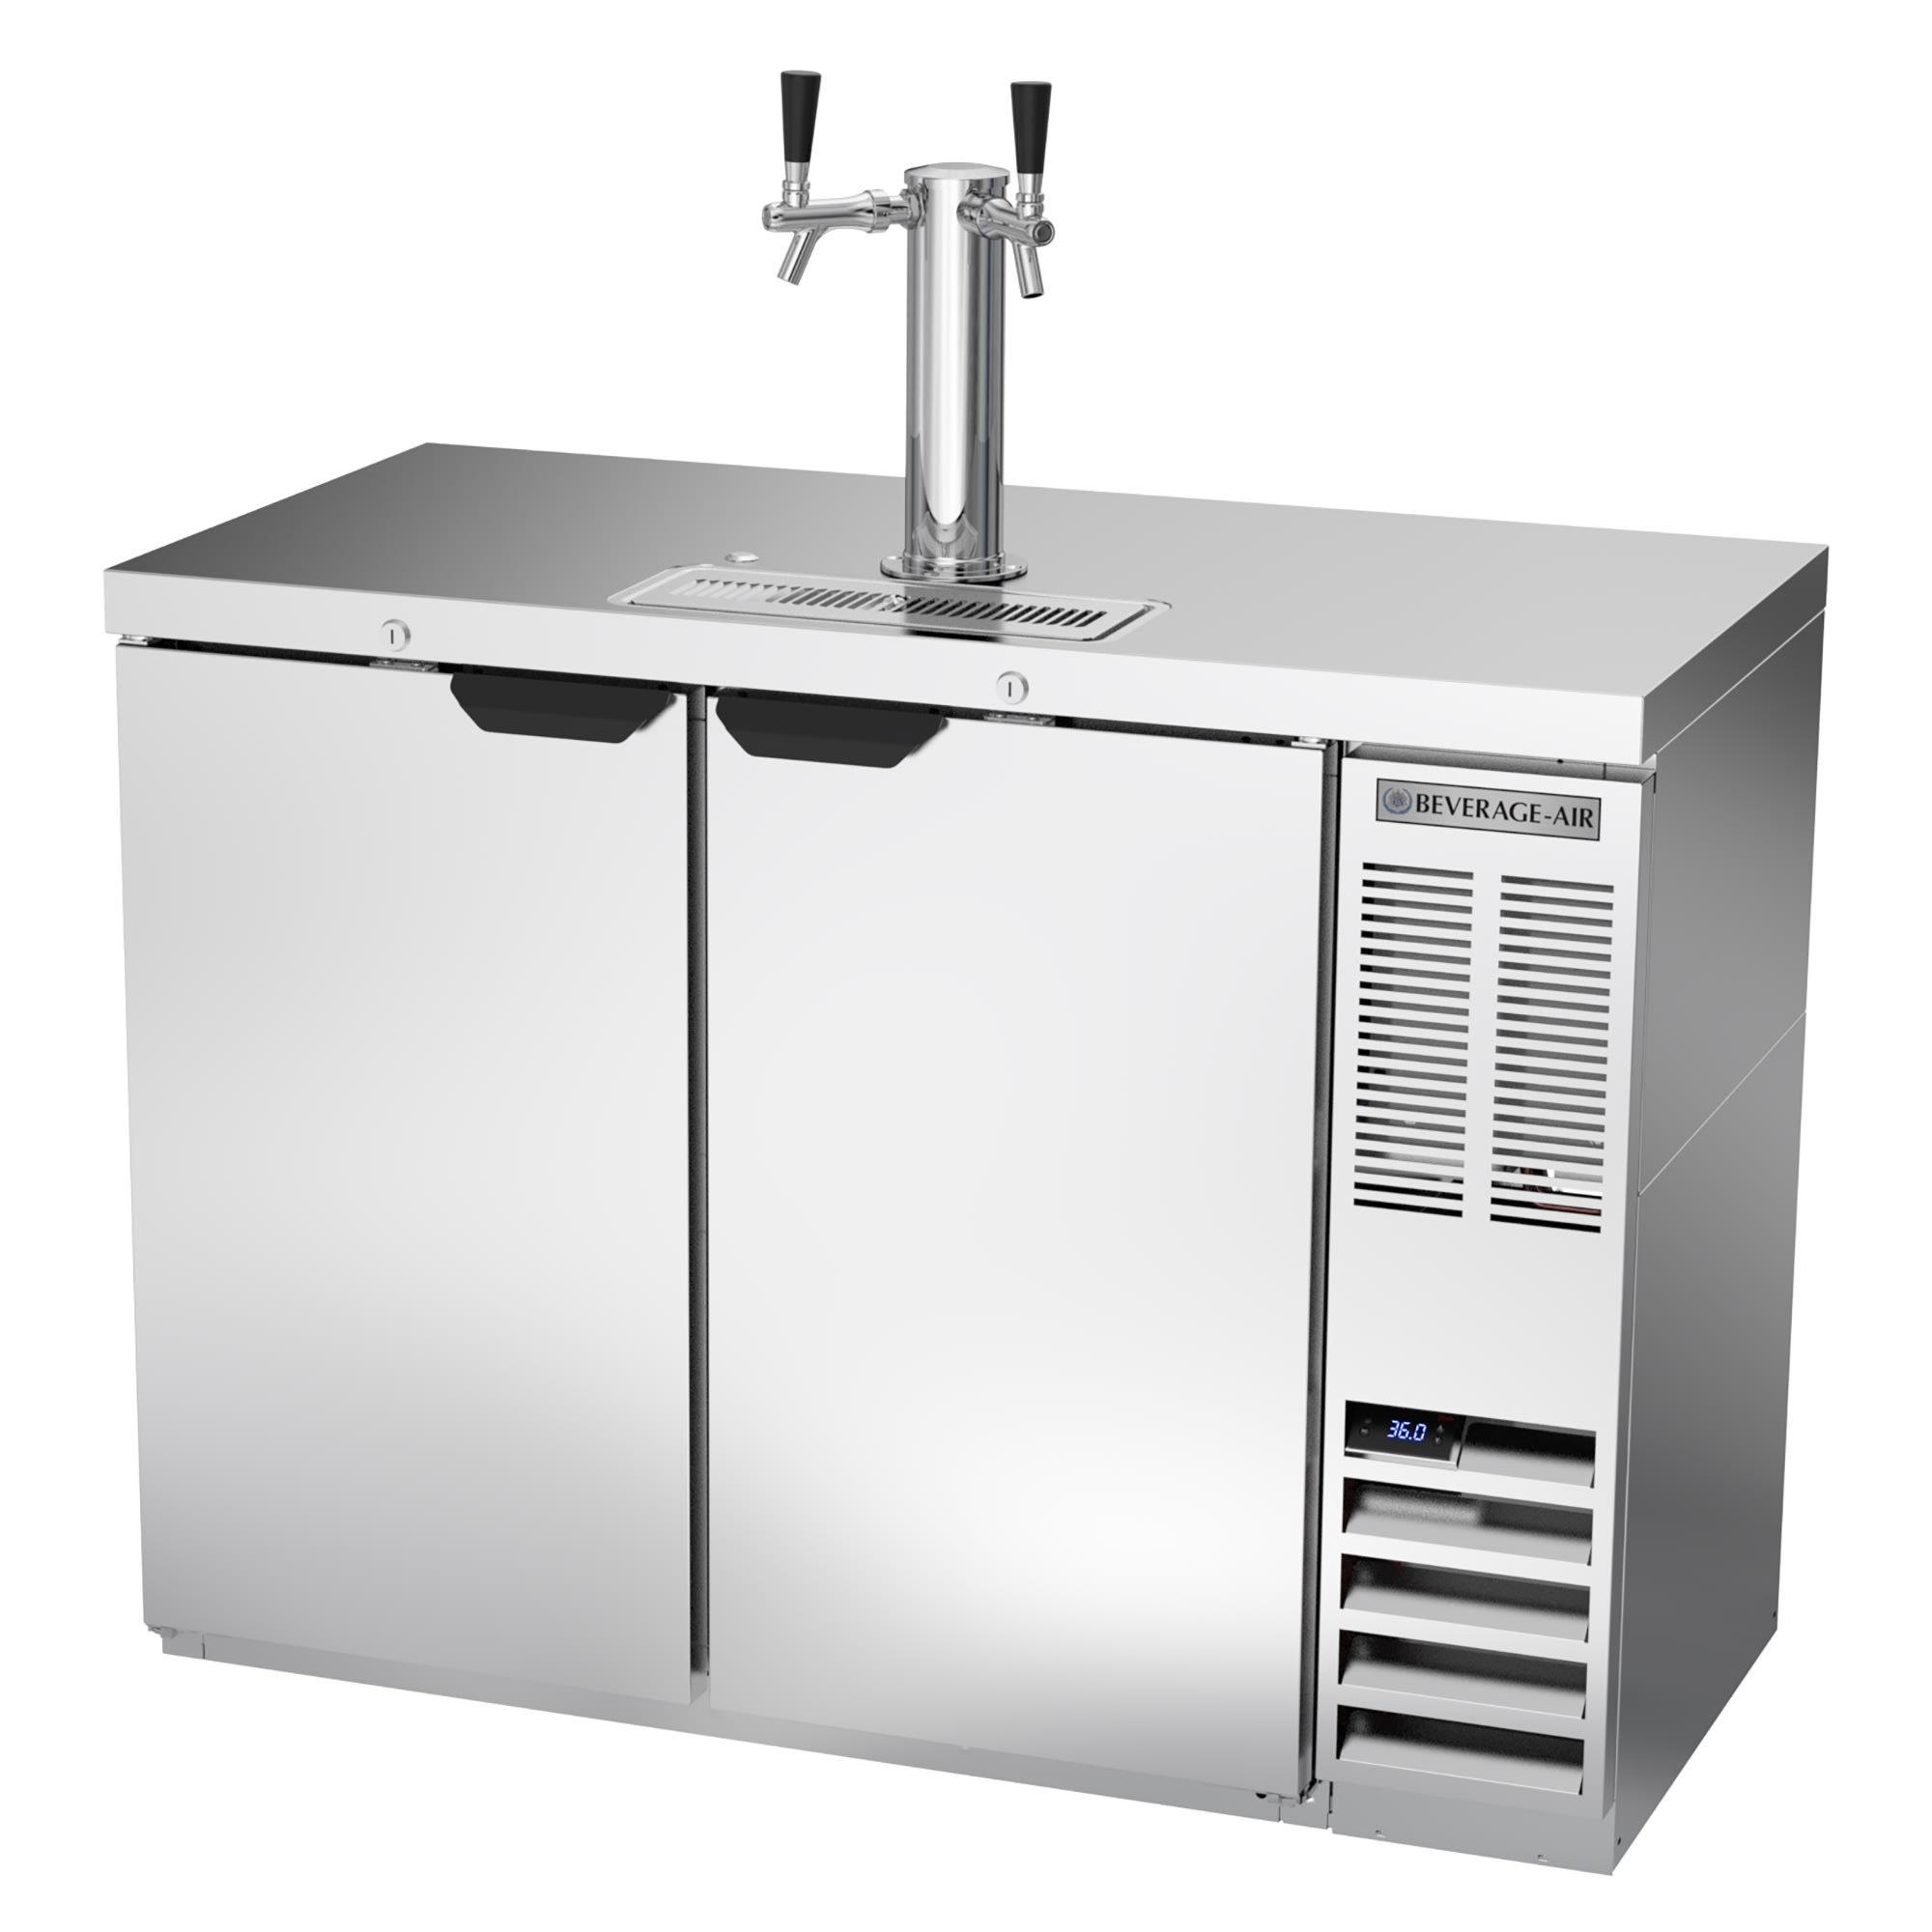 "Beverage Air DD48HC-1-S 48"" Draft Beer System w/ (2) Keg Capacity - (1) Column, Stainless, 115v"